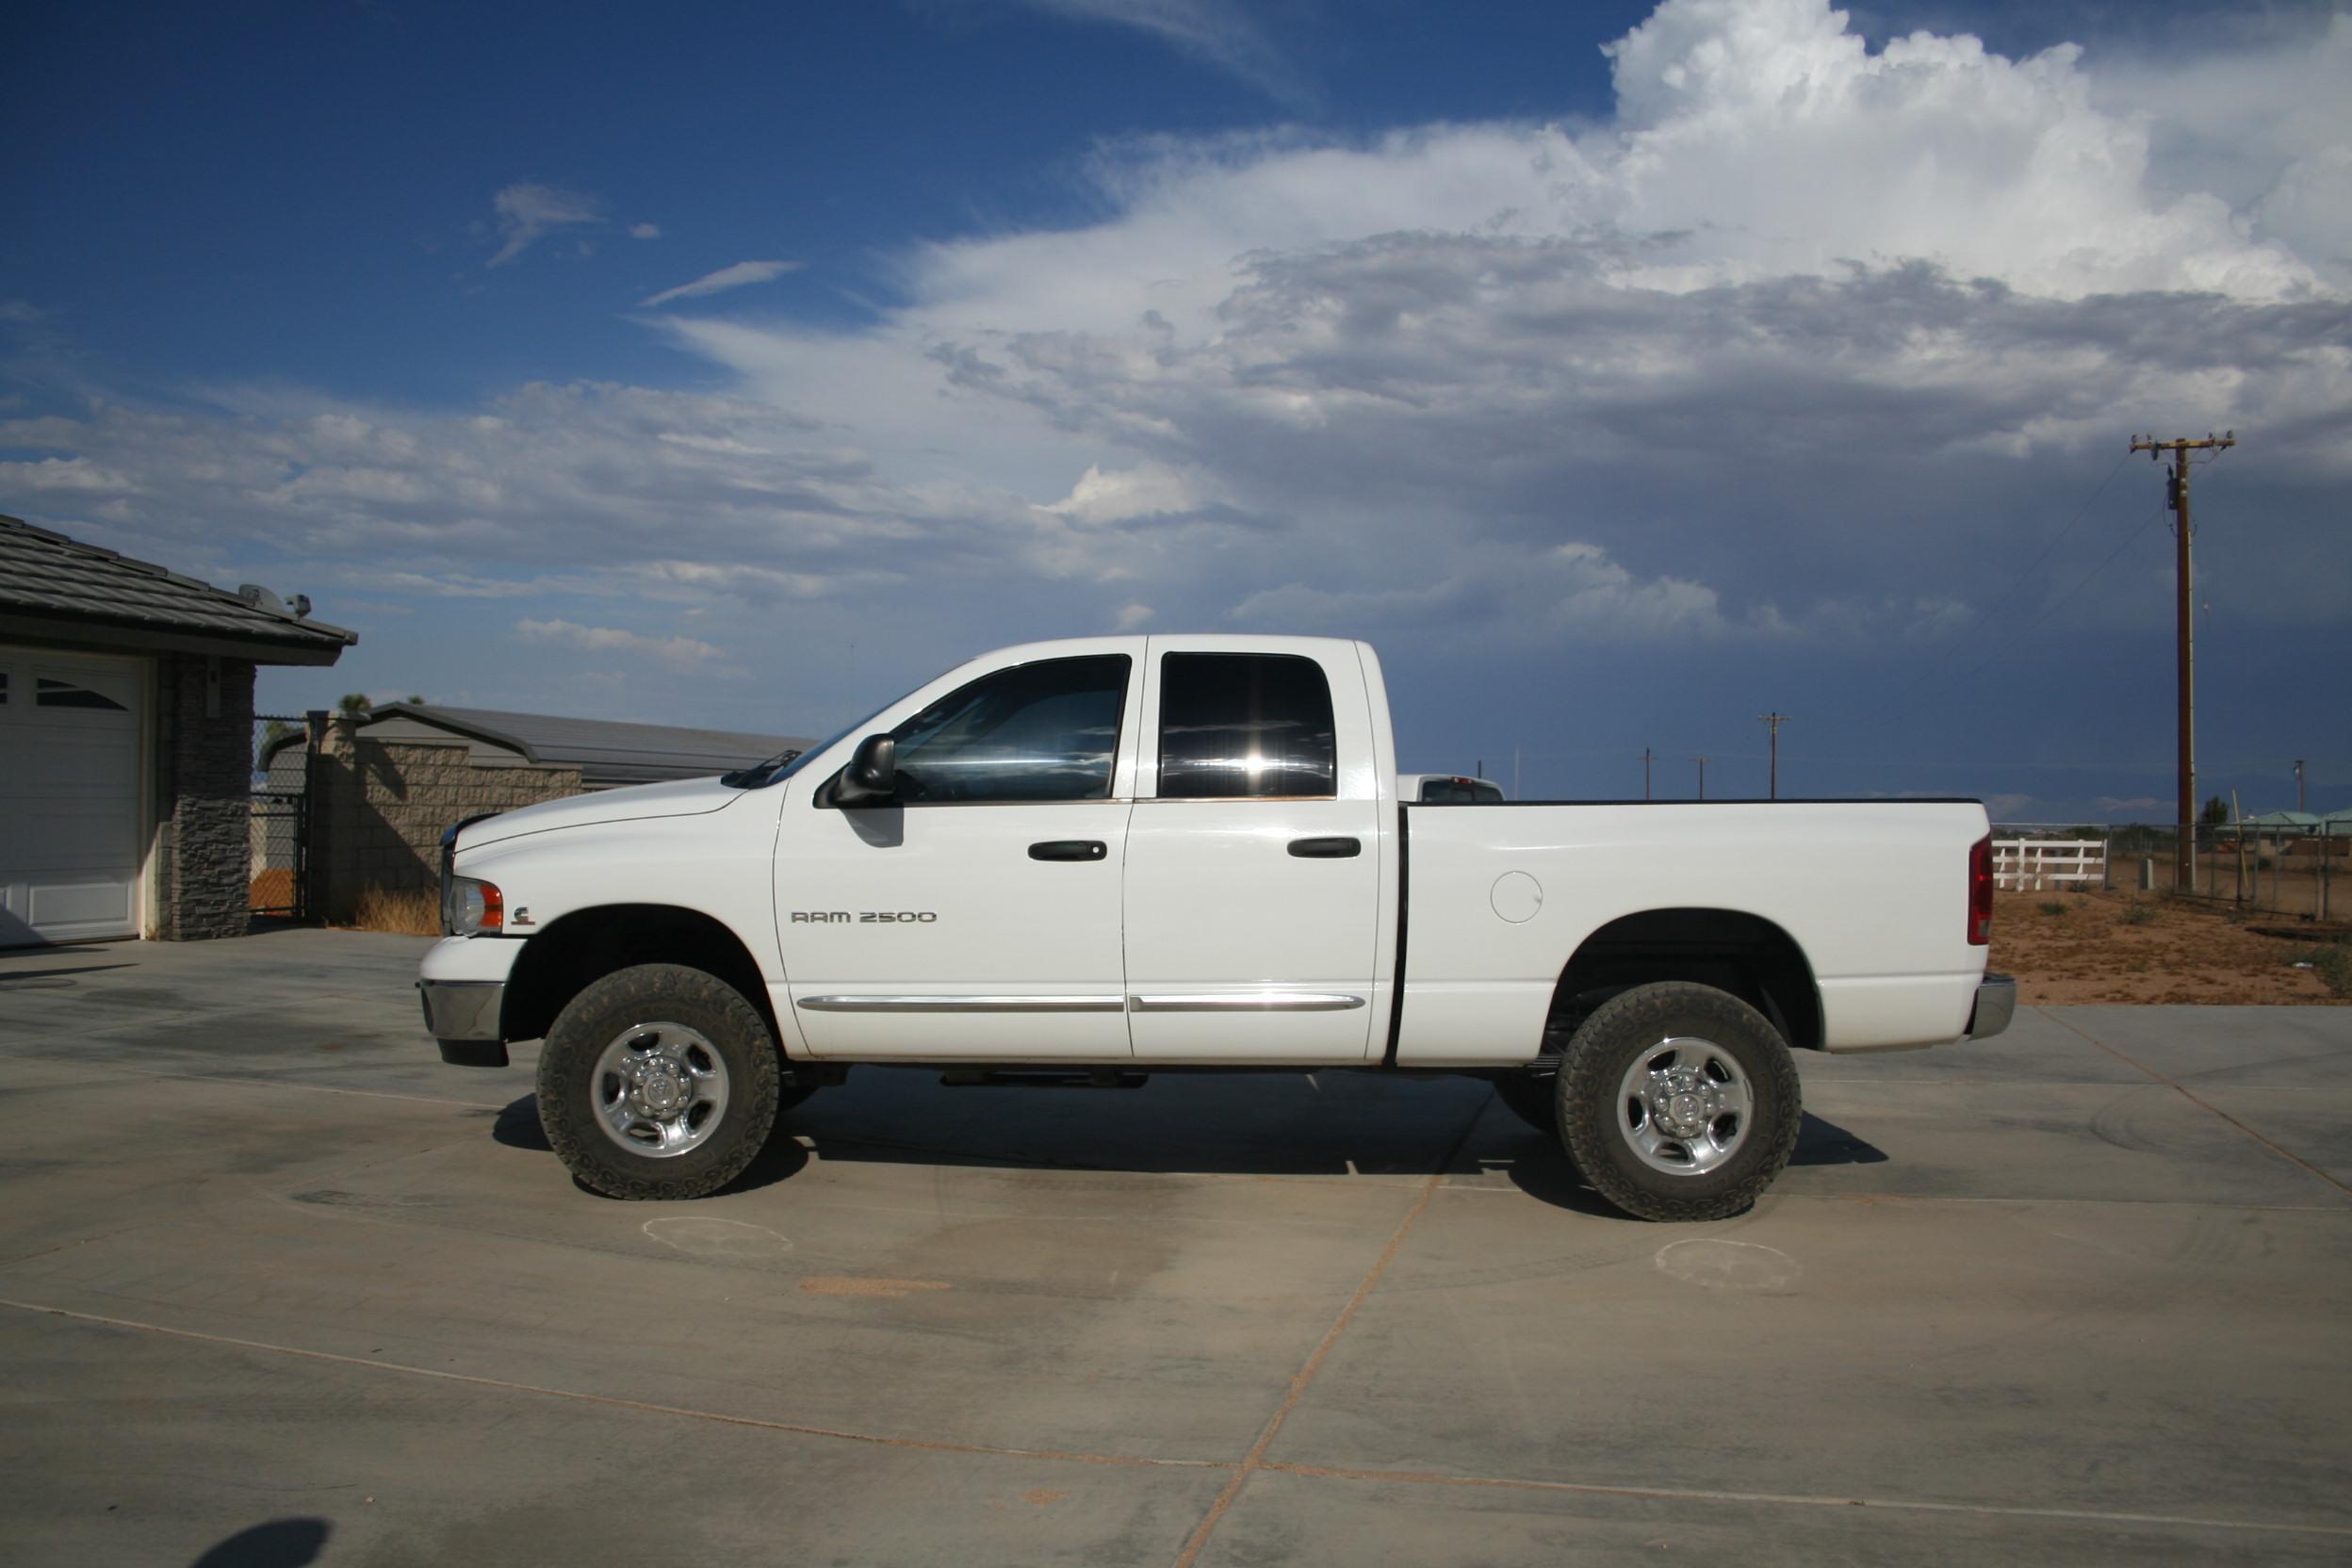 2005 dodge ram 2500 quad cab 4wd trucks autos for sale dumont dune riders. Black Bedroom Furniture Sets. Home Design Ideas